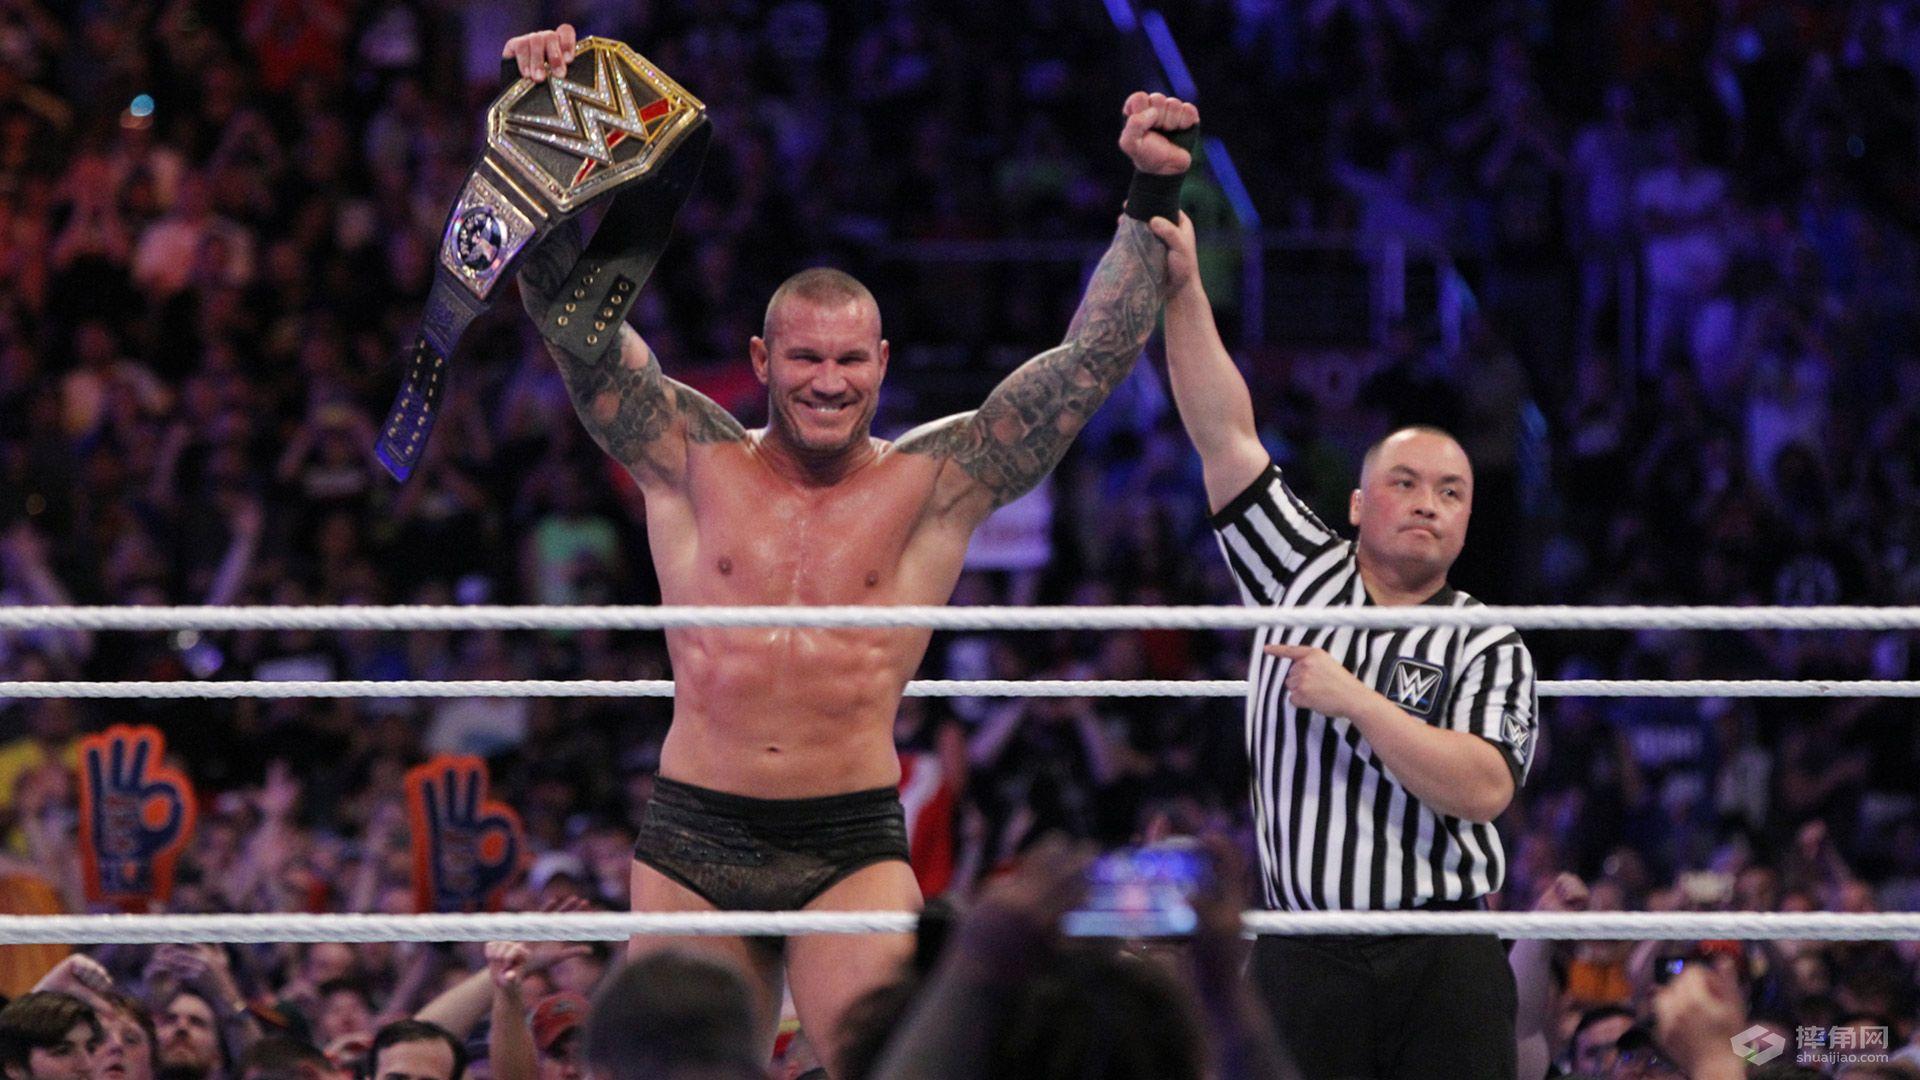 WWE 摔角狂热33战报 主战赛里出情怀 传奇精神屹立不倒